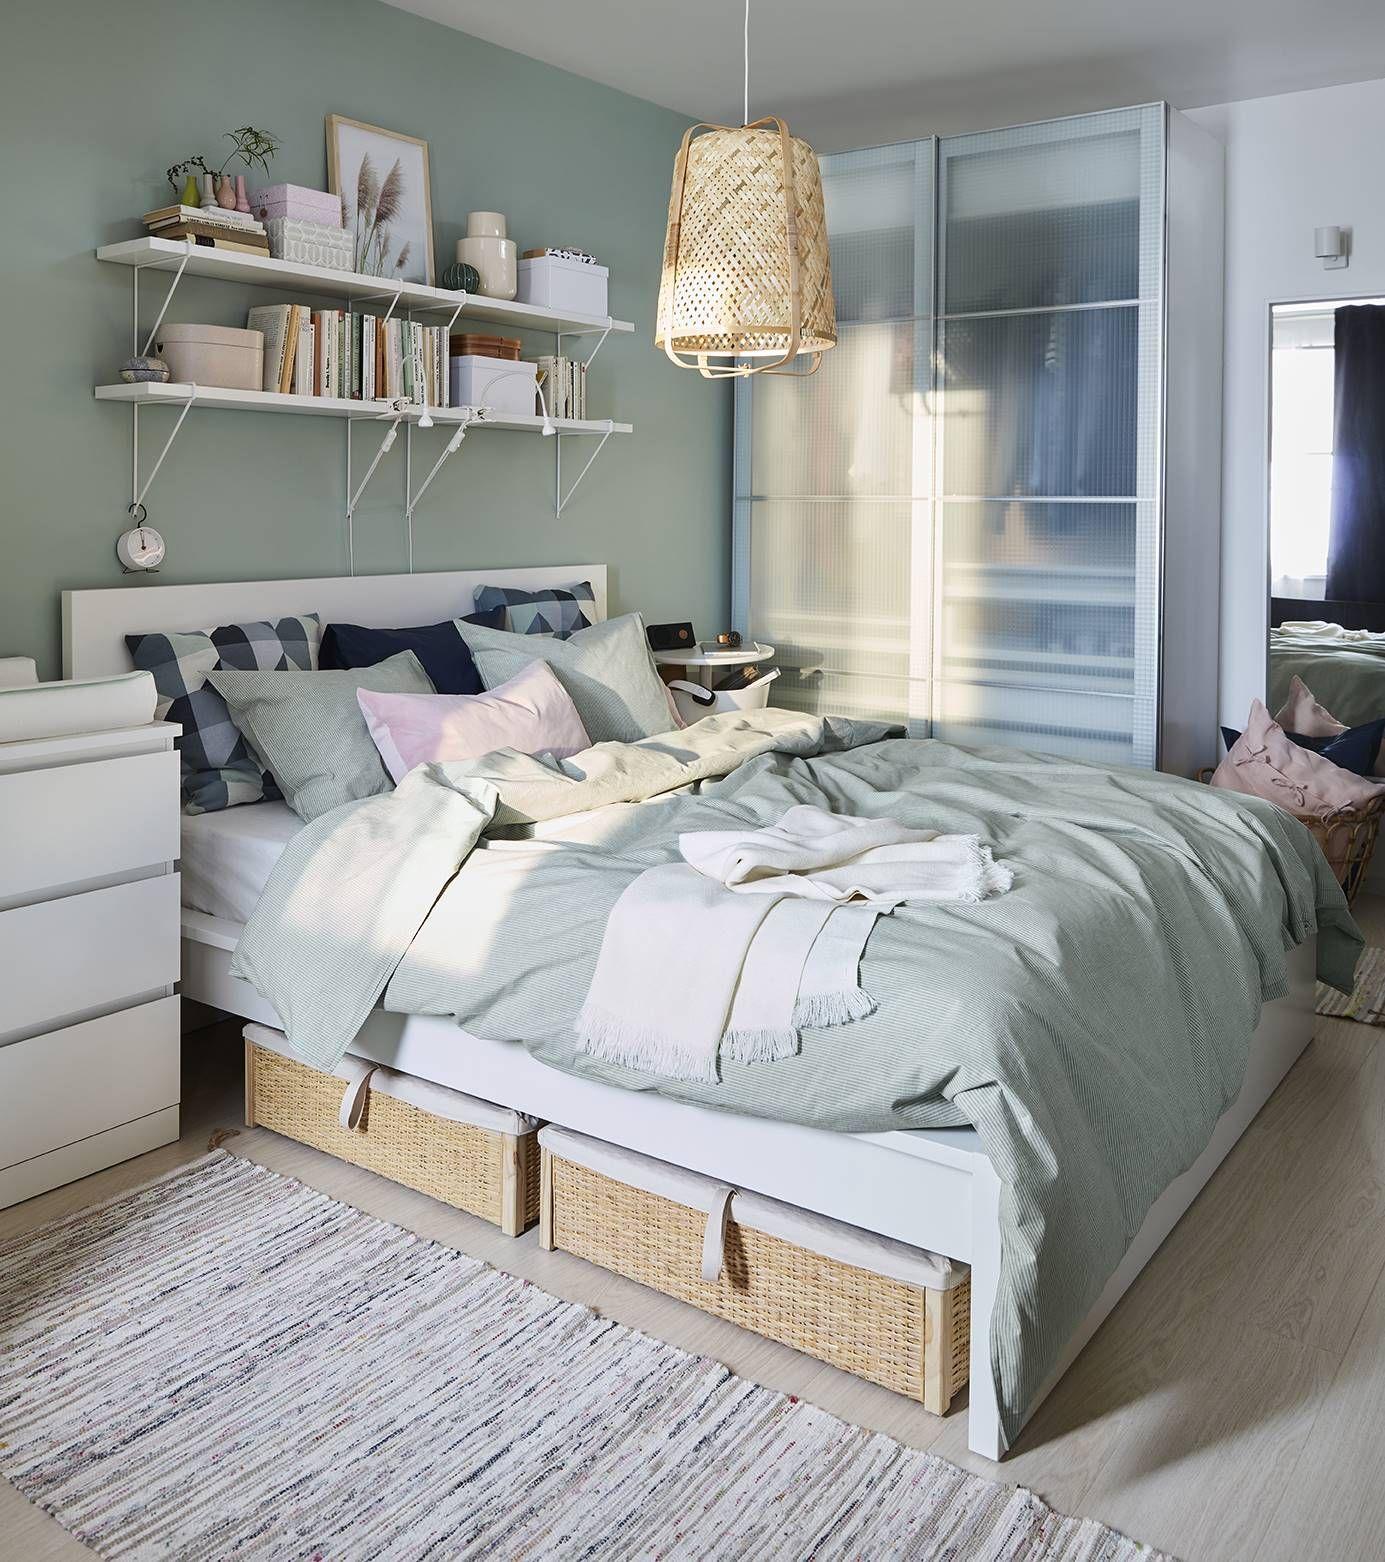 Les Premières Images Du Catalogue Ikea 2020 édition Daoût Planete Deco A Homes World Hausdekoration Schlafzimmer Wohn Bedroom Trends Home Furniture Home